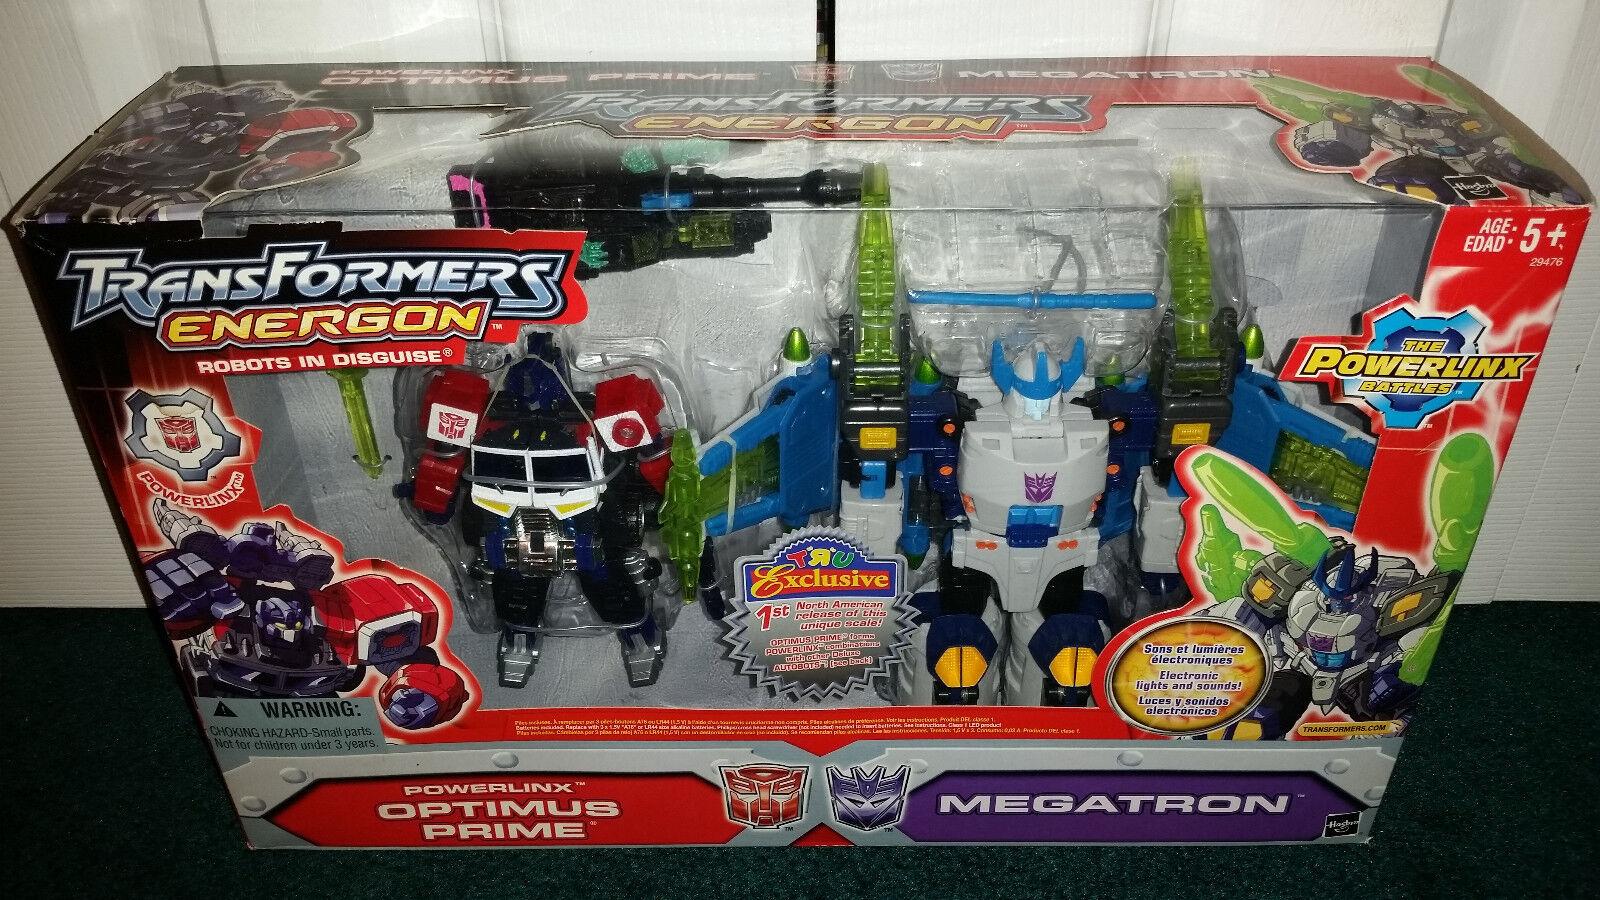 Optimus Prime vs Megatron Energon Transformers Hasbro TRU Toys R Us MISP  2004